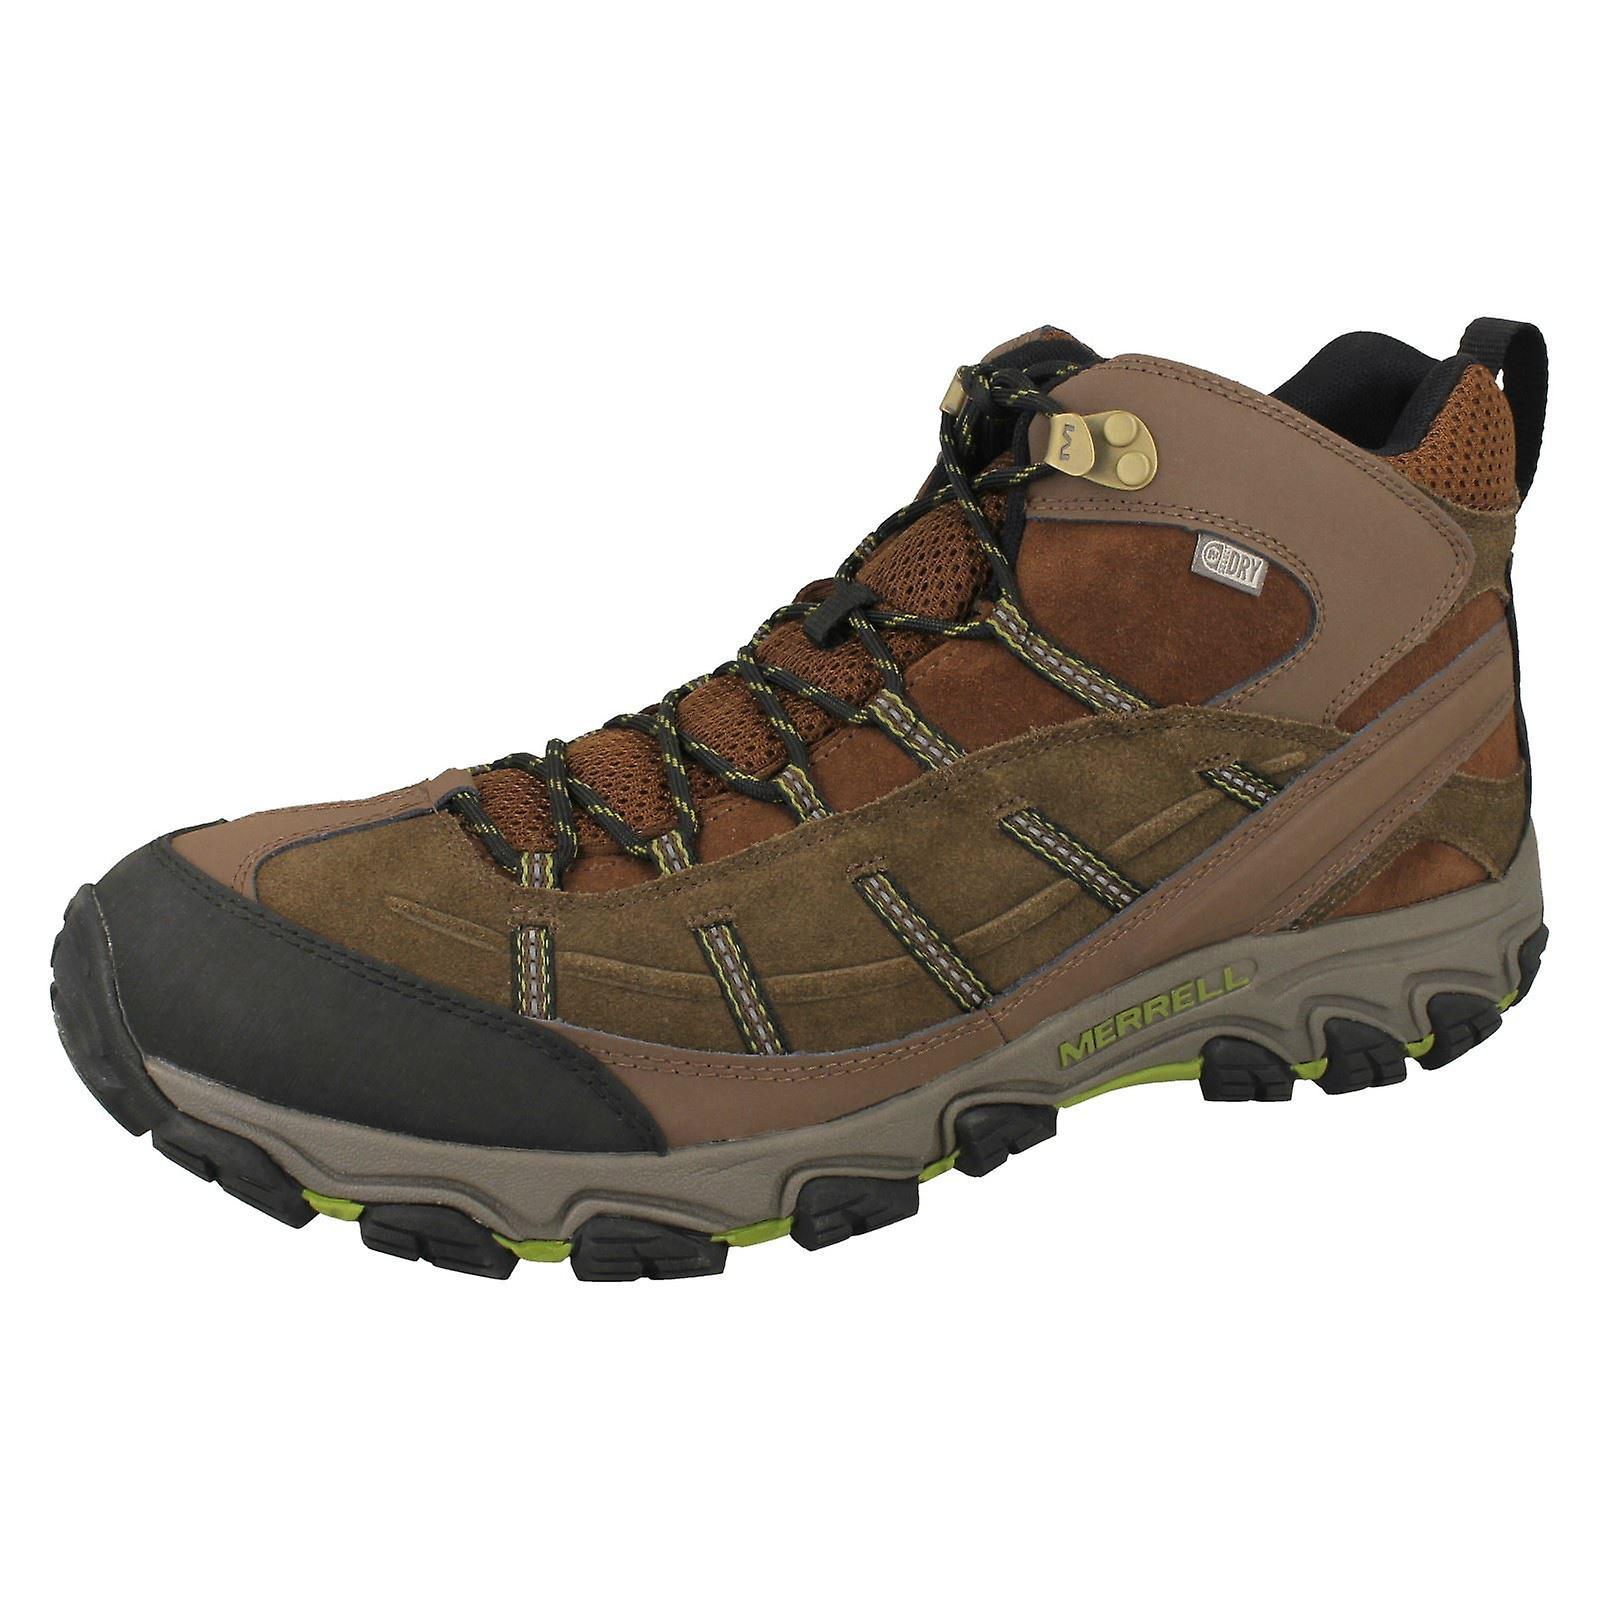 174f31c3e8 Mens Merrell Waterproof Walking Boots Terramorph Mid